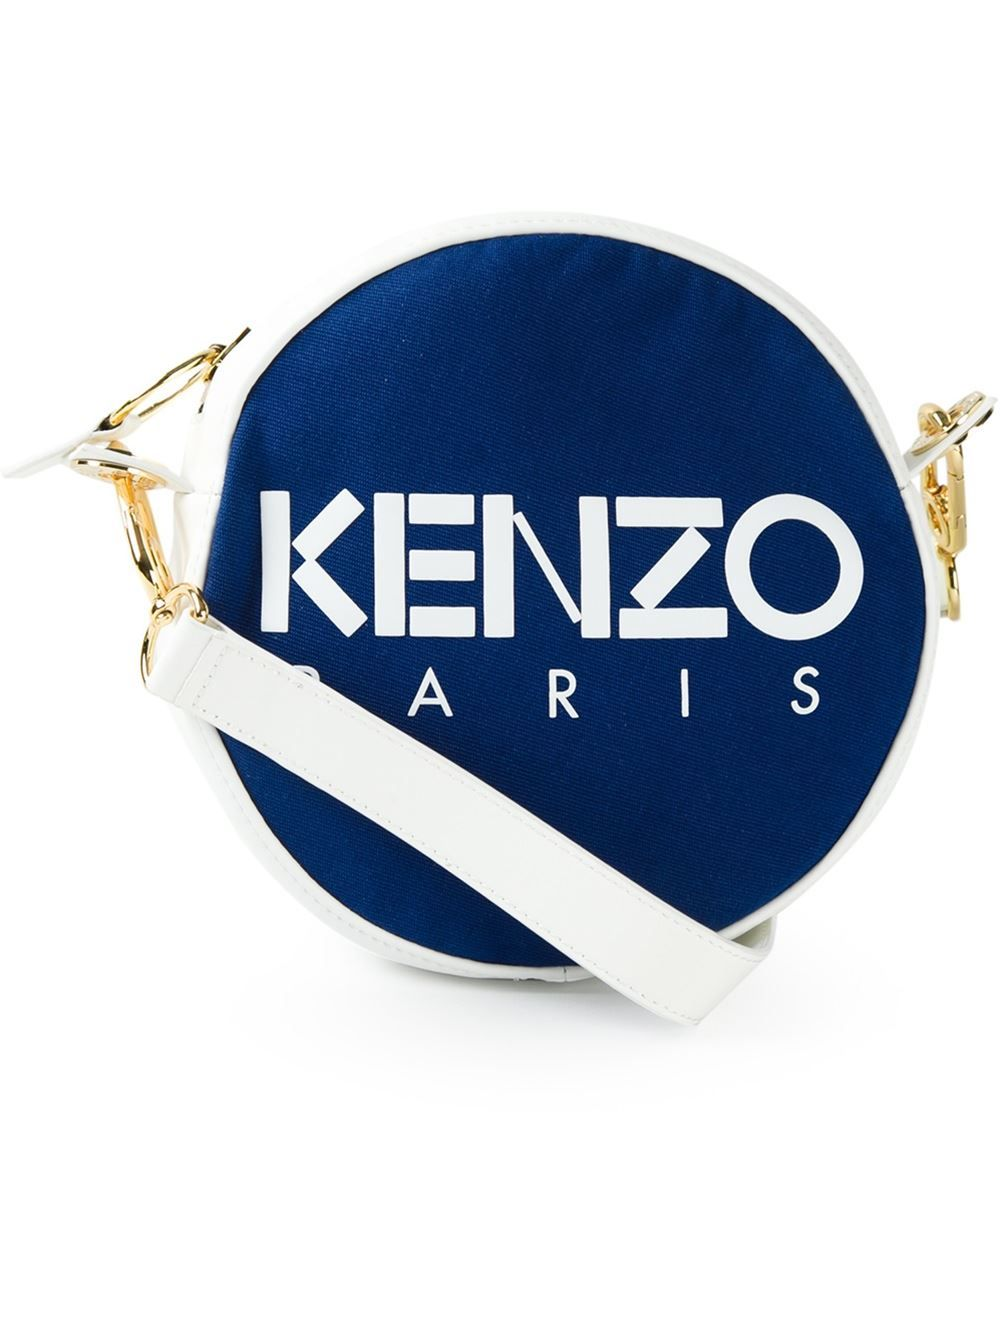 "Kenzo Bolso Bandolera ""kenzo"" - Stefania Mode - Farfetch.com"